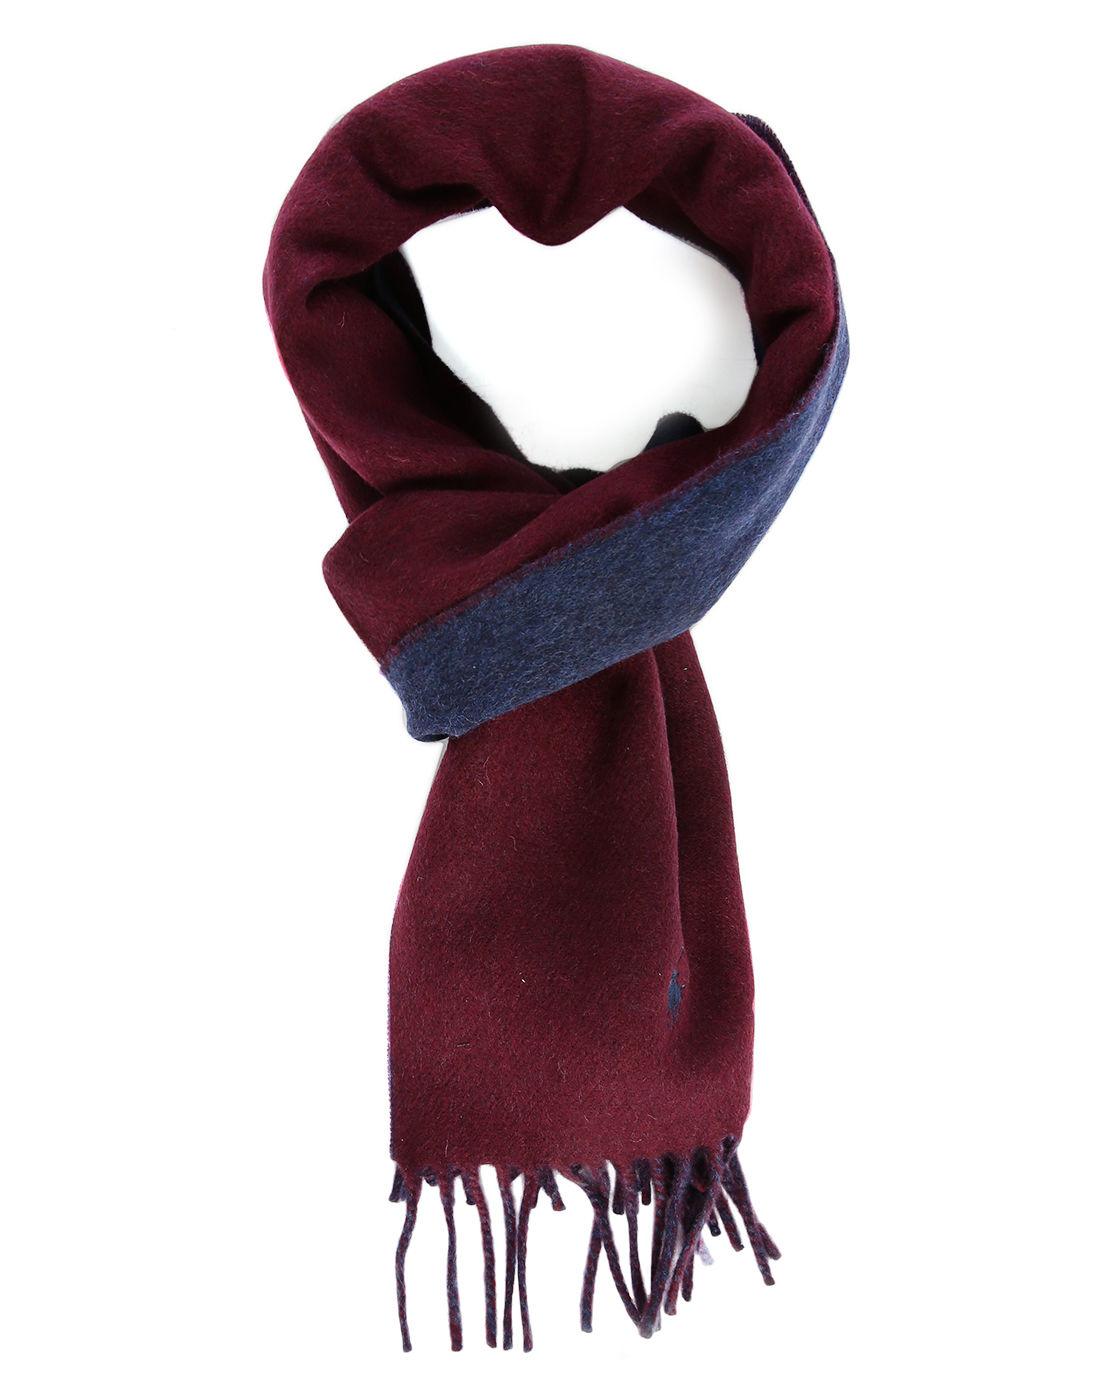 ralph lauren men 39 s cashmere scarves w rtersee public. Black Bedroom Furniture Sets. Home Design Ideas